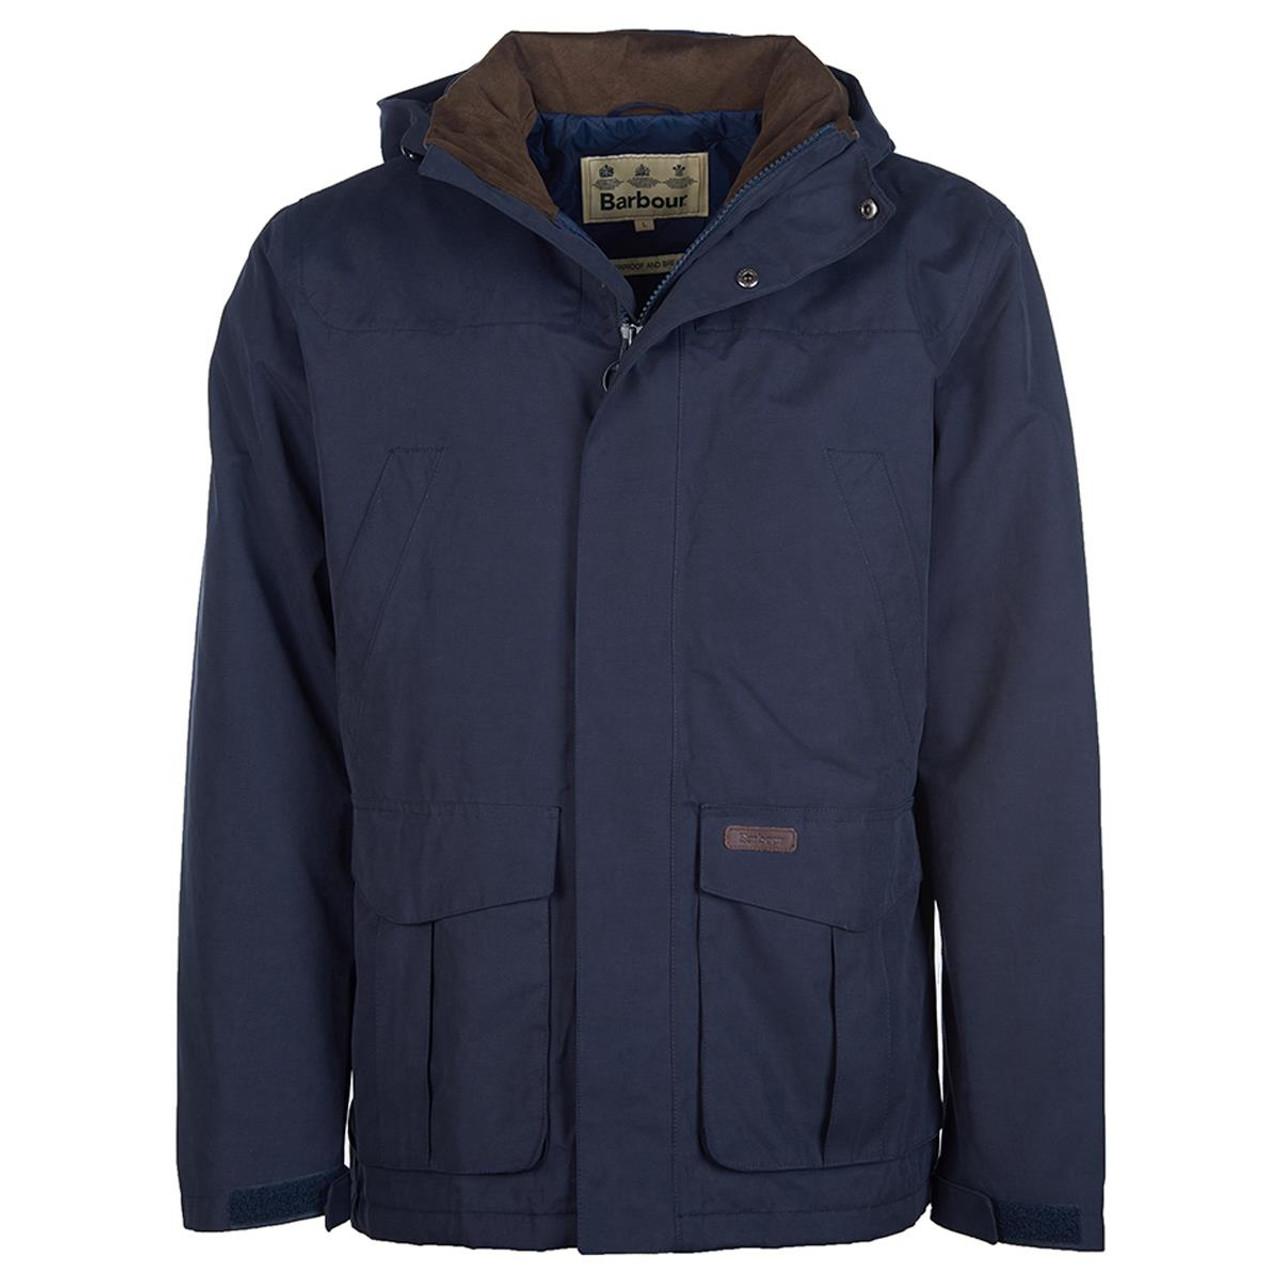 Navy Barbour Brockstone Jacket